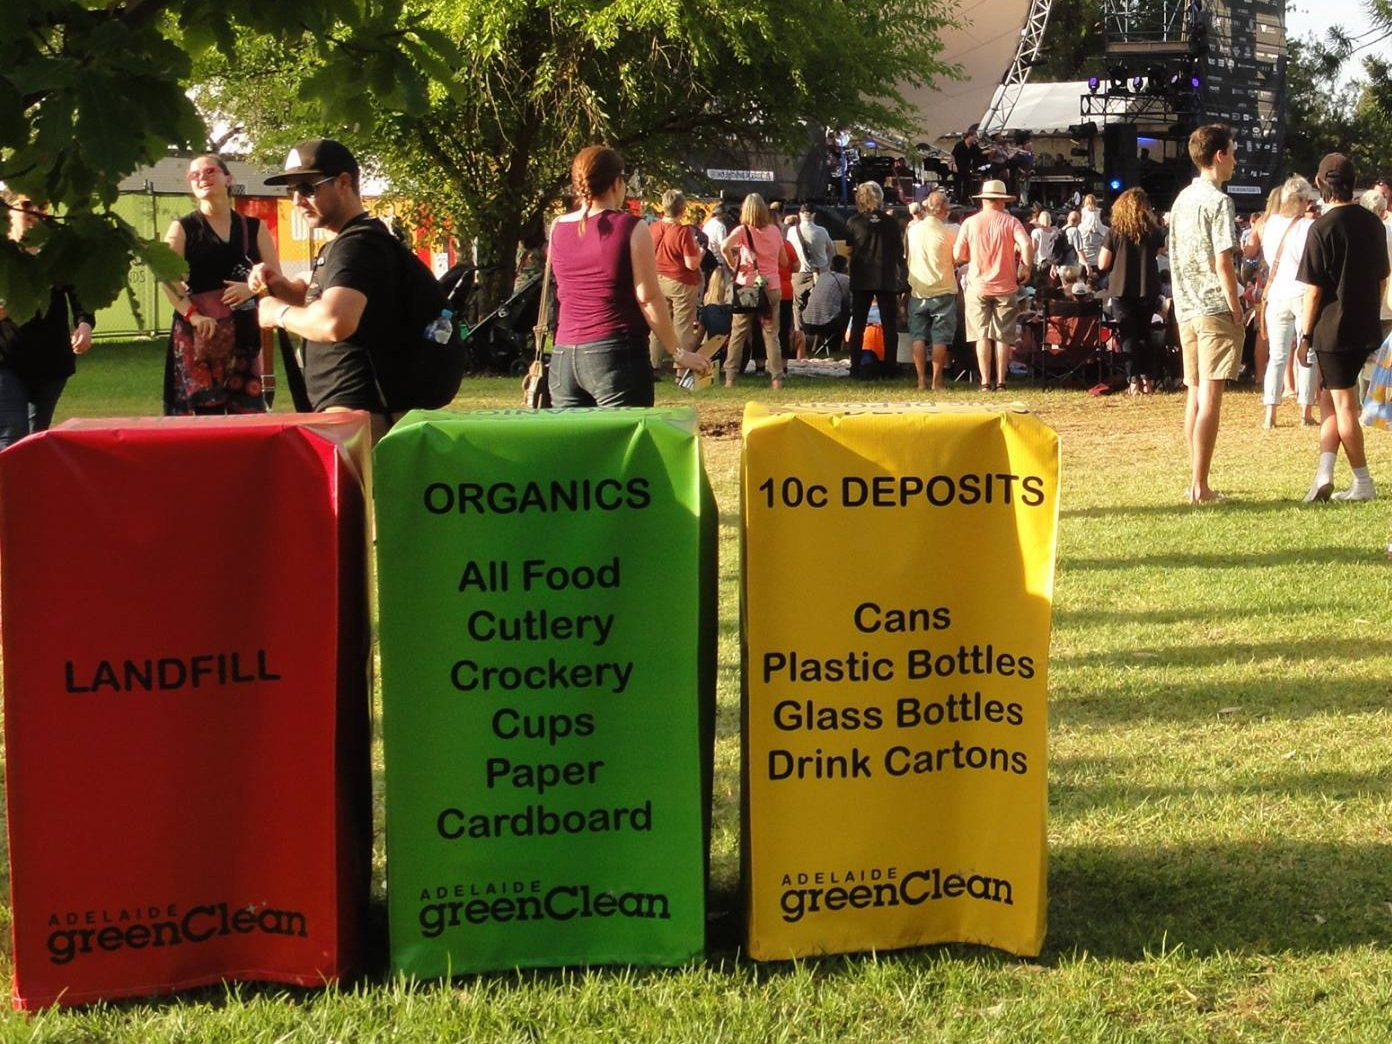 Handpicked Festival Bins Reduce Waste